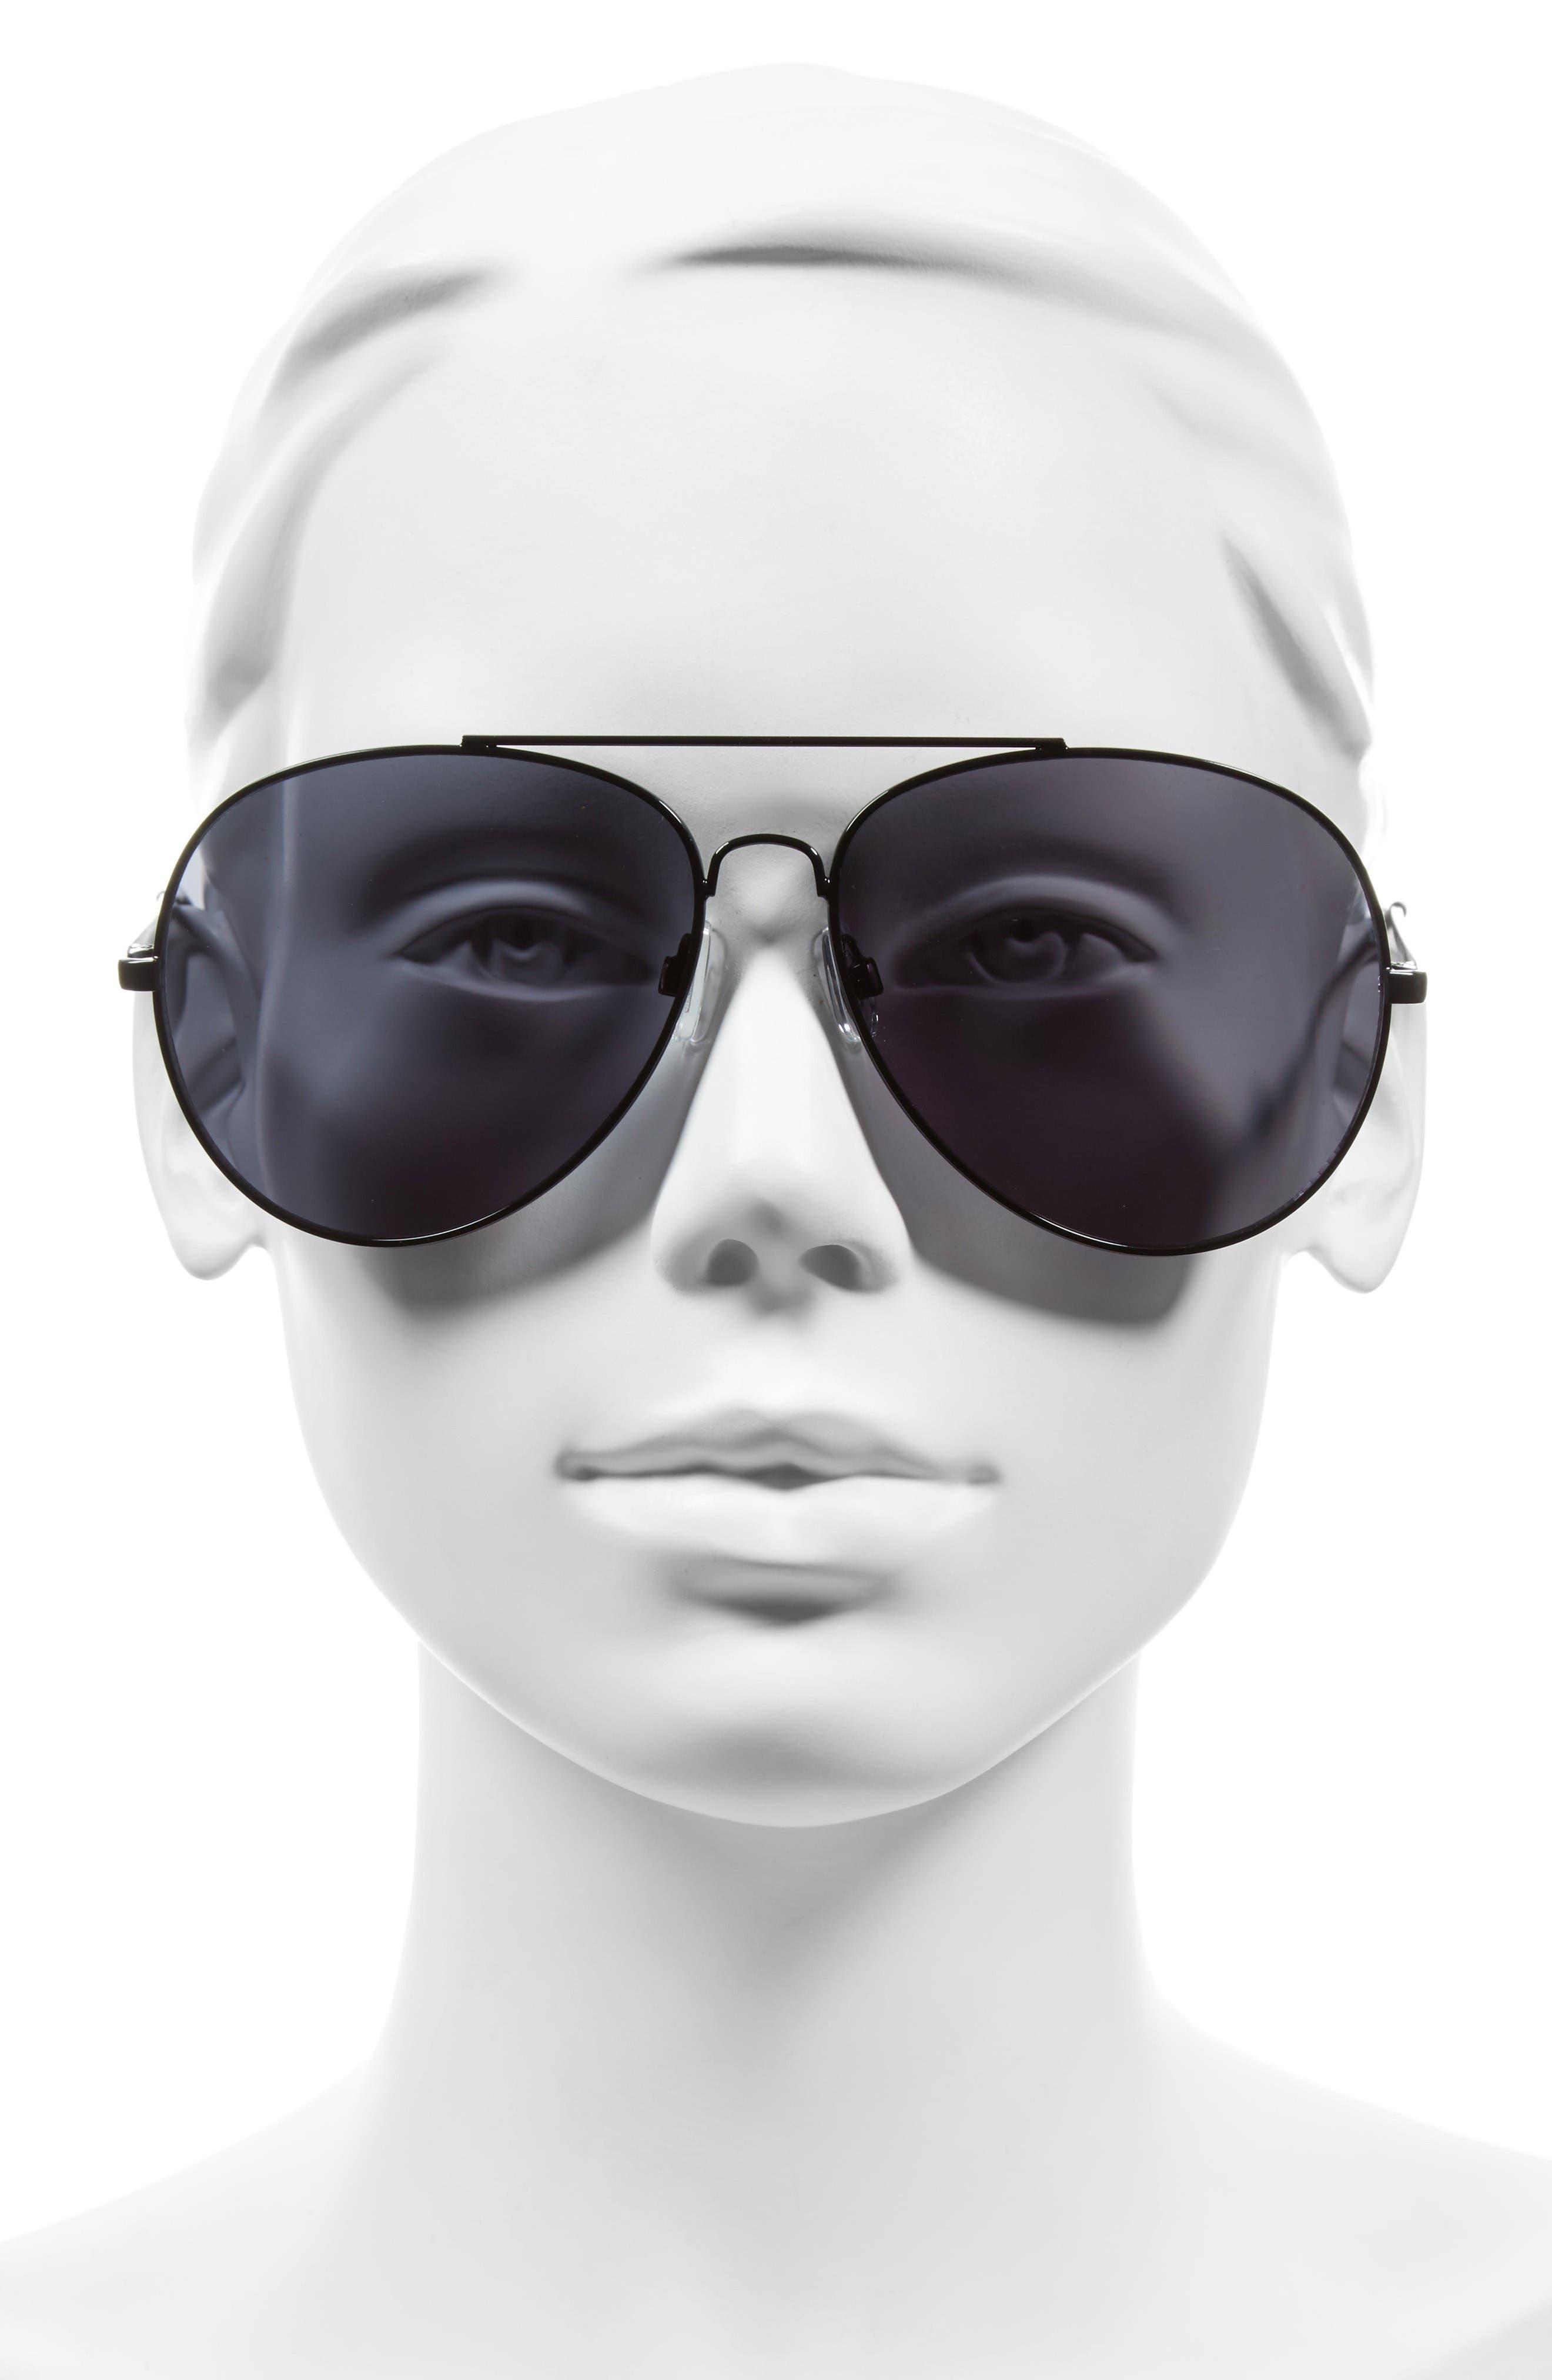 65mm Oversize Aviator Sunglasses,                             Alternate thumbnail 2, color,                             Black/ Black